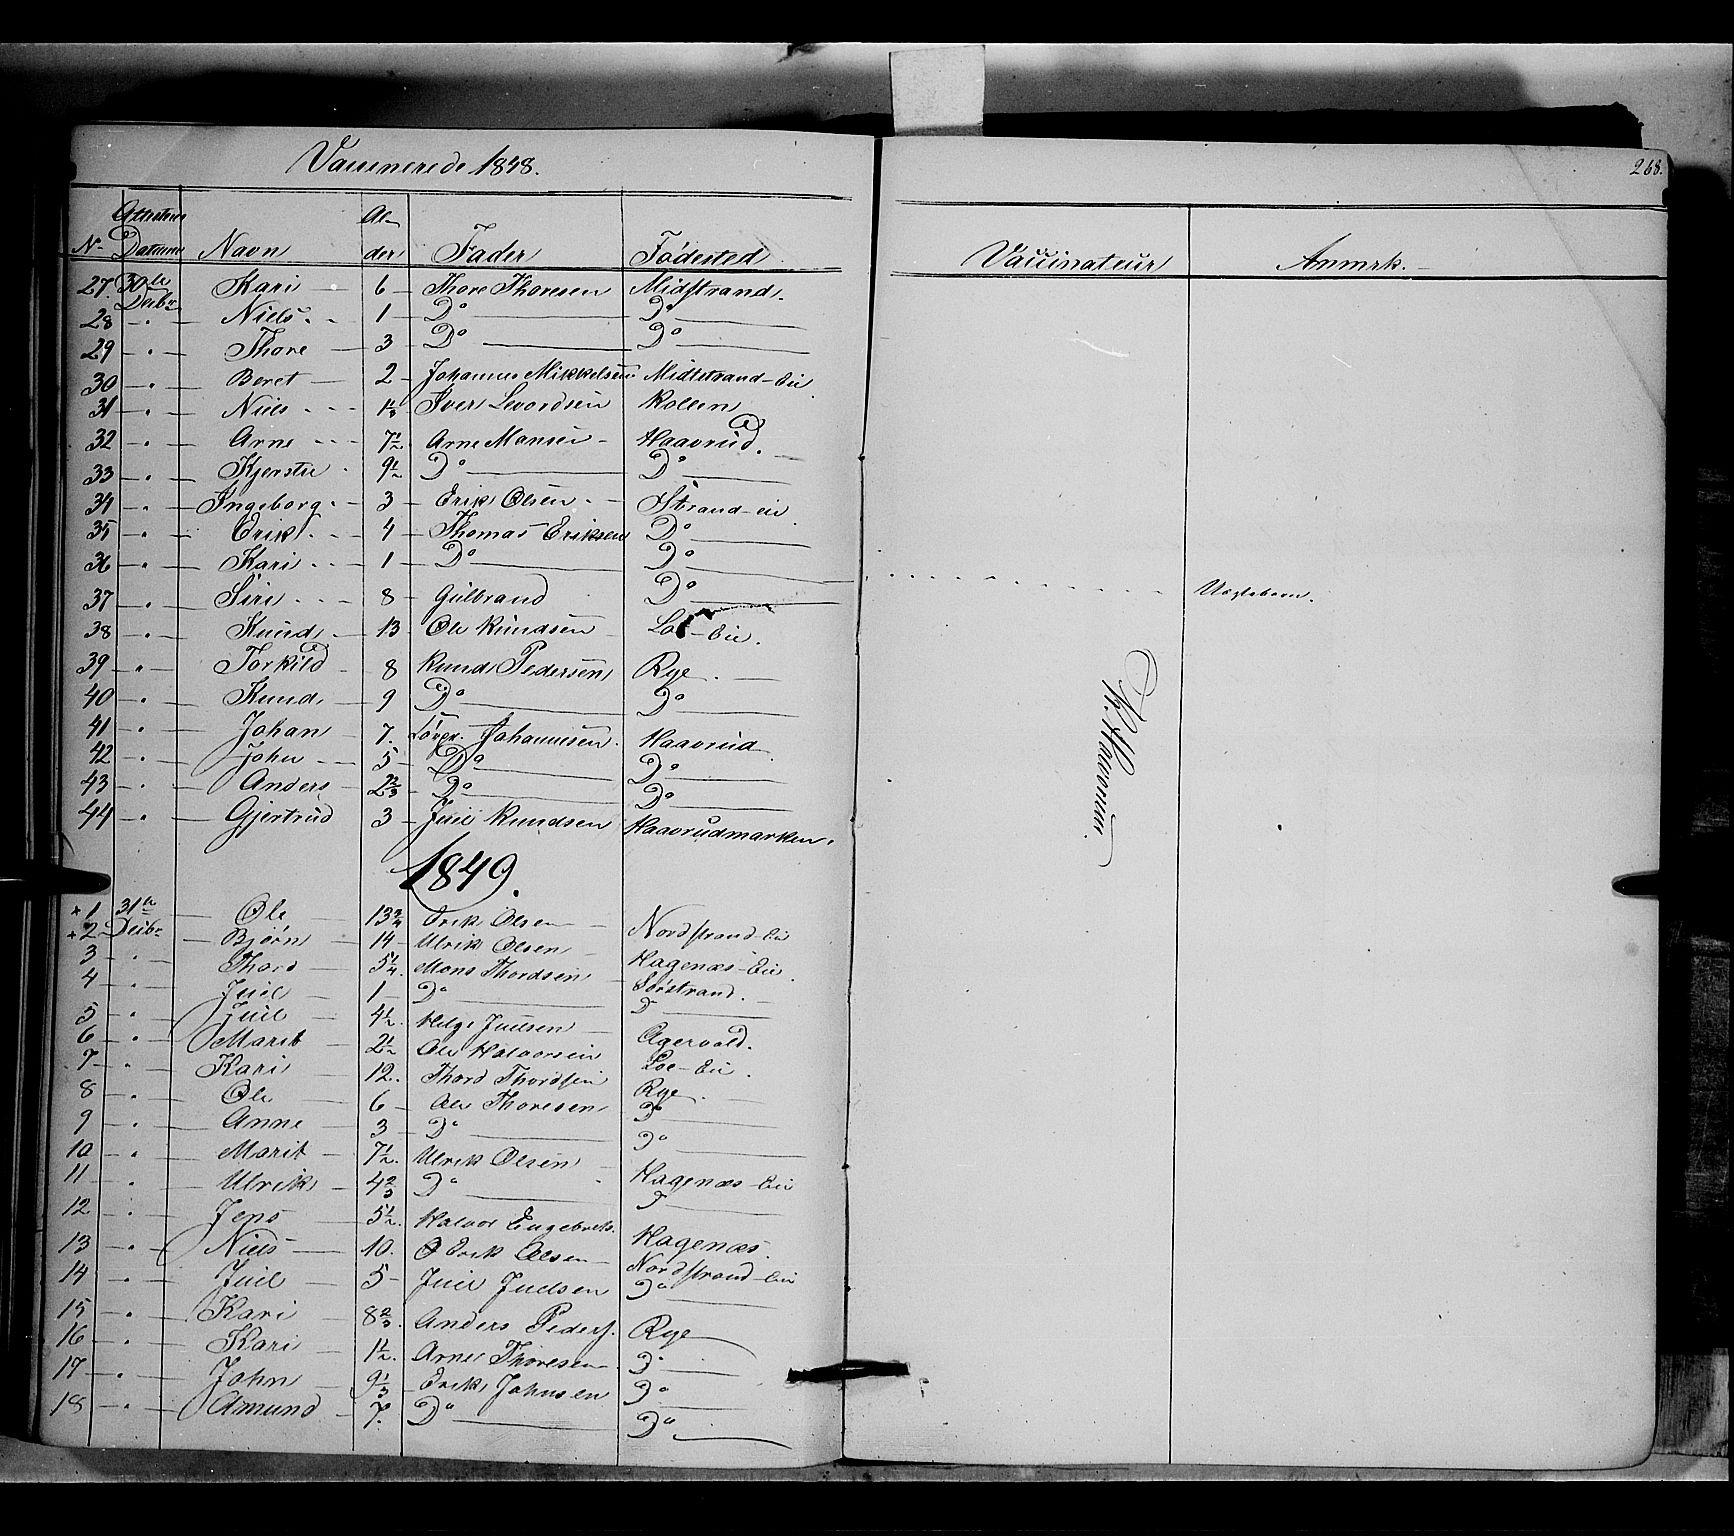 SAH, Nord-Aurdal prestekontor, Ministerialbok nr. 5, 1842-1863, s. 268